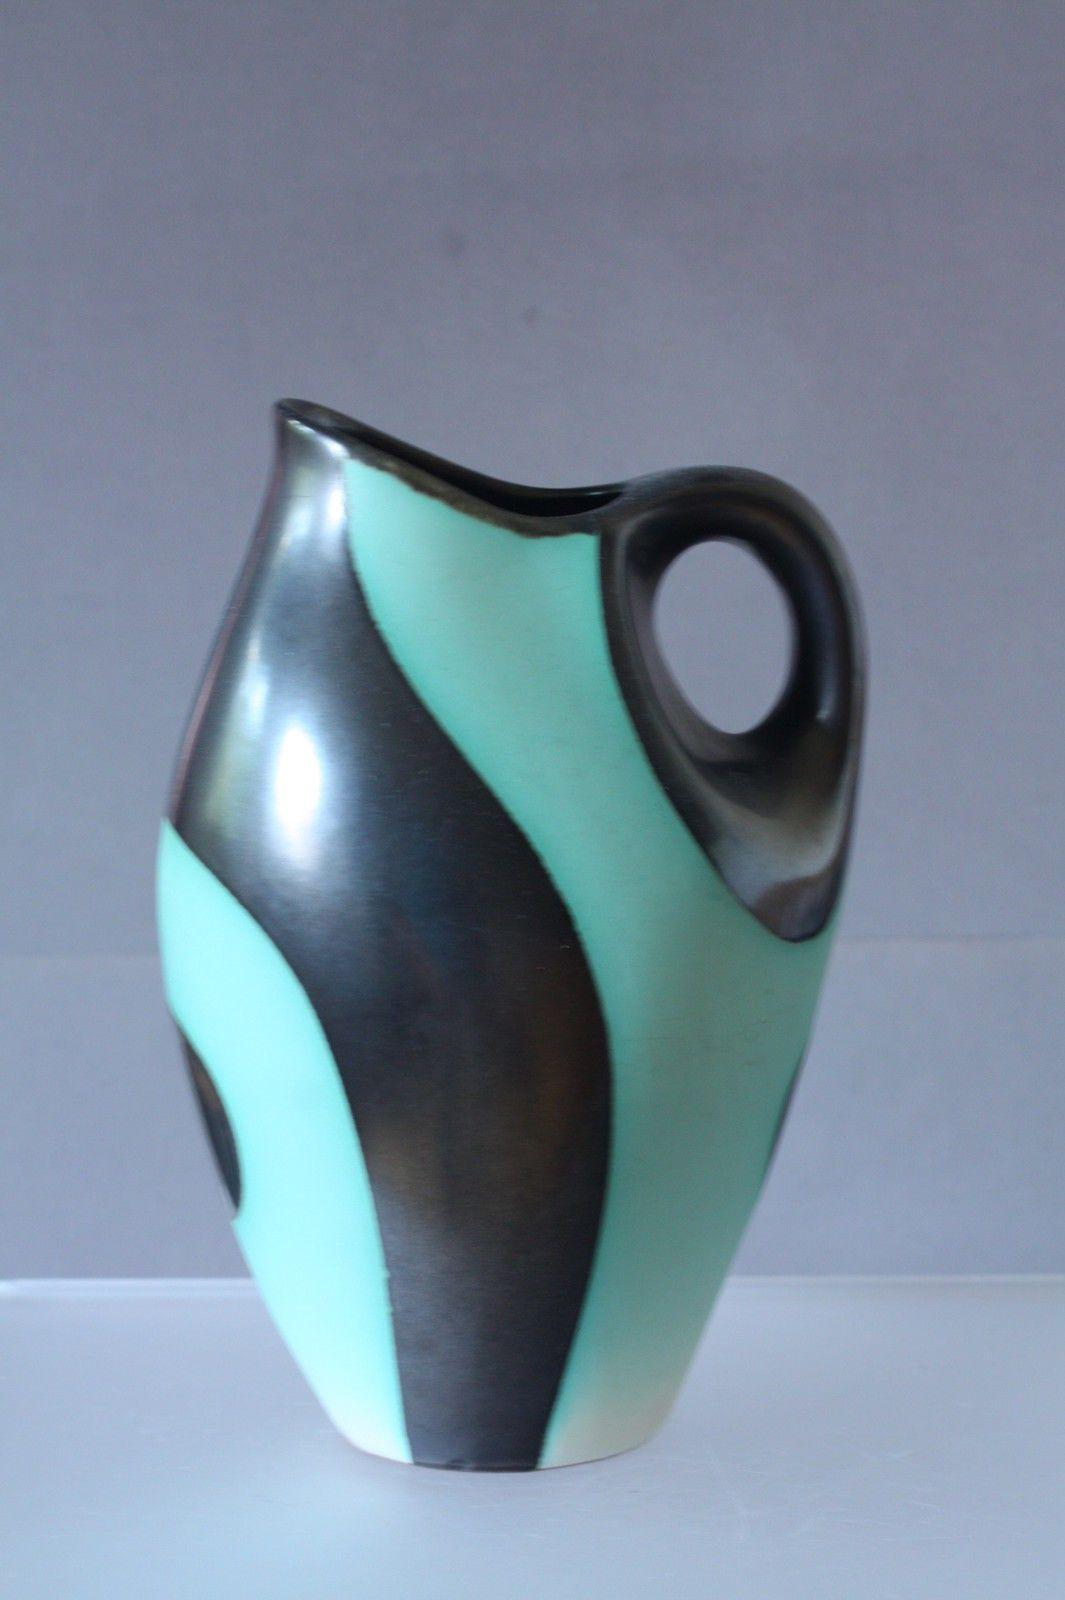 Keramik Vase Fritz Van Daalen 1953 Grün Schwarz Organische Form